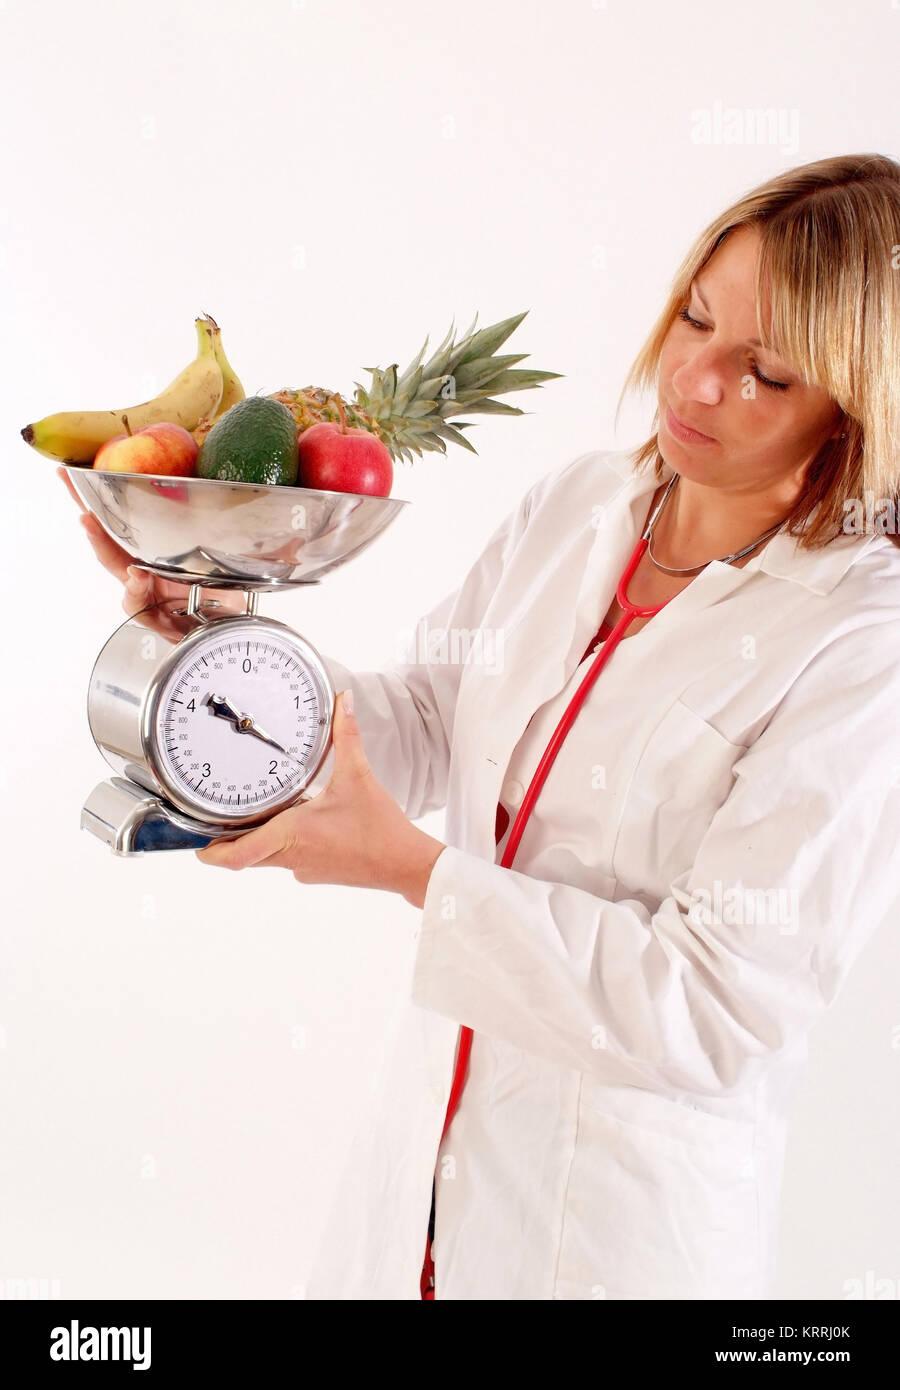 Diaetassistentin, Ernaehrungsberater - nutritionist - Stock Image